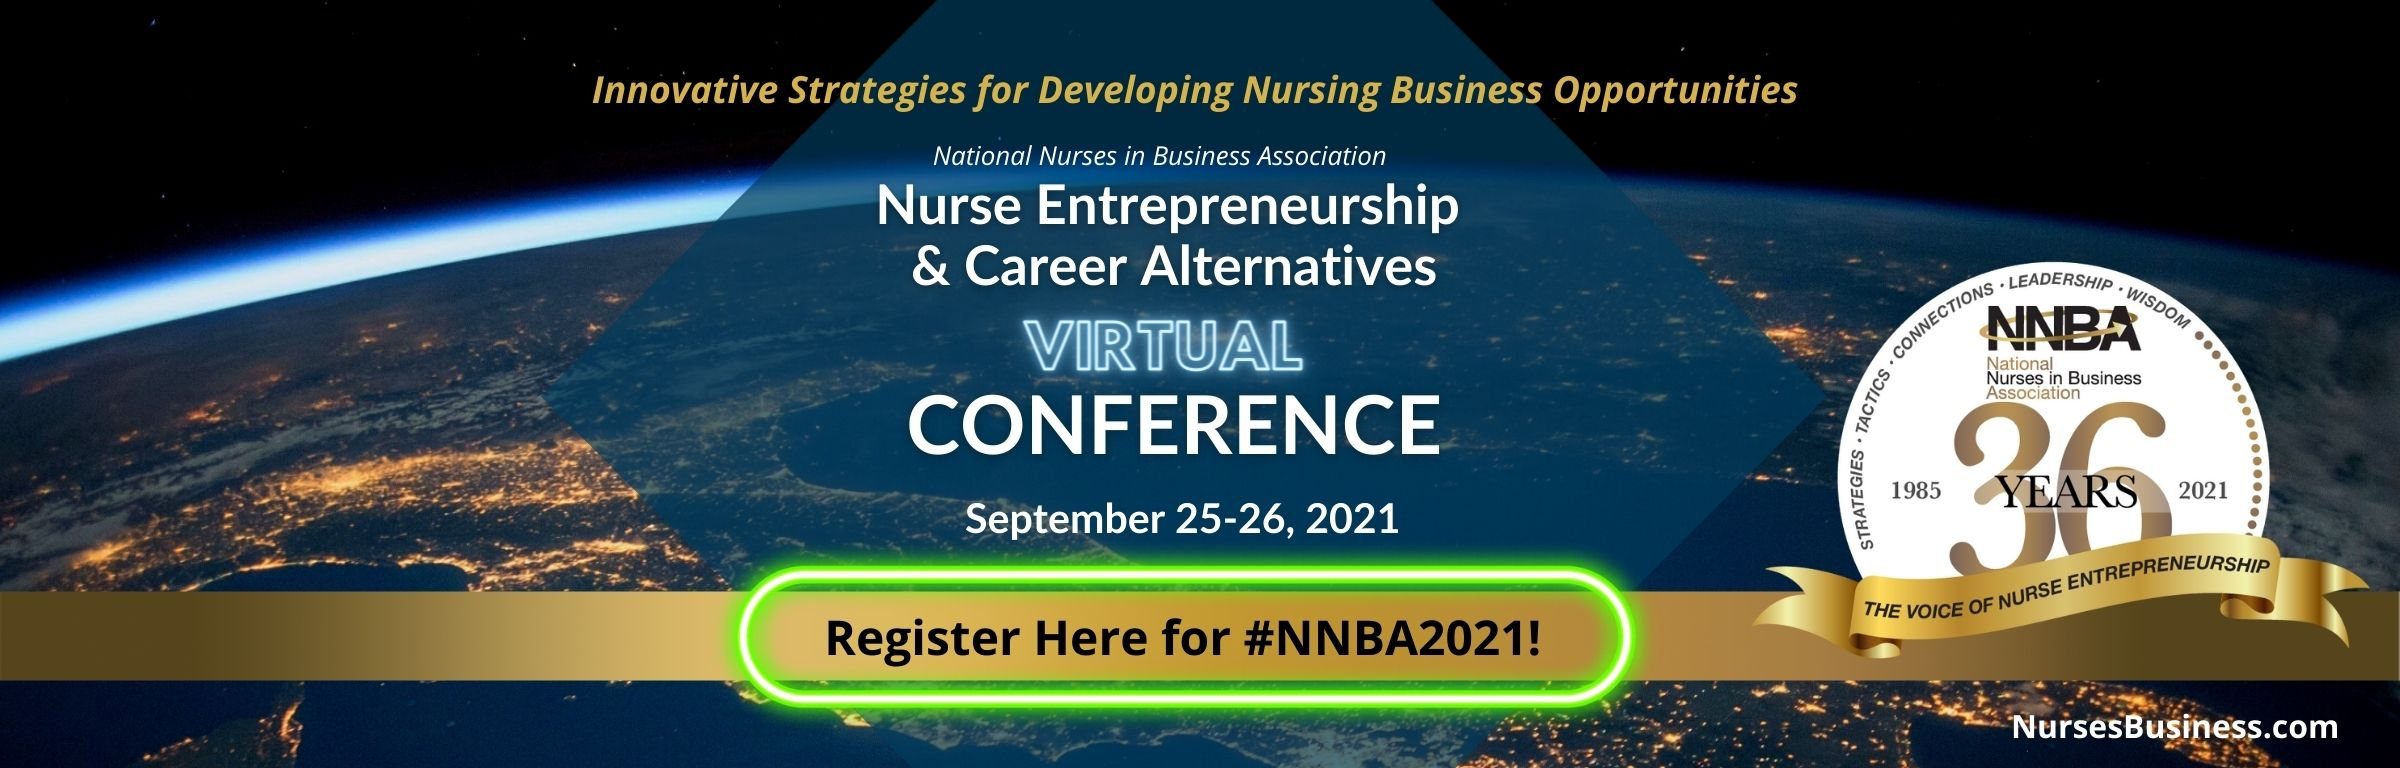 NNBA Conference